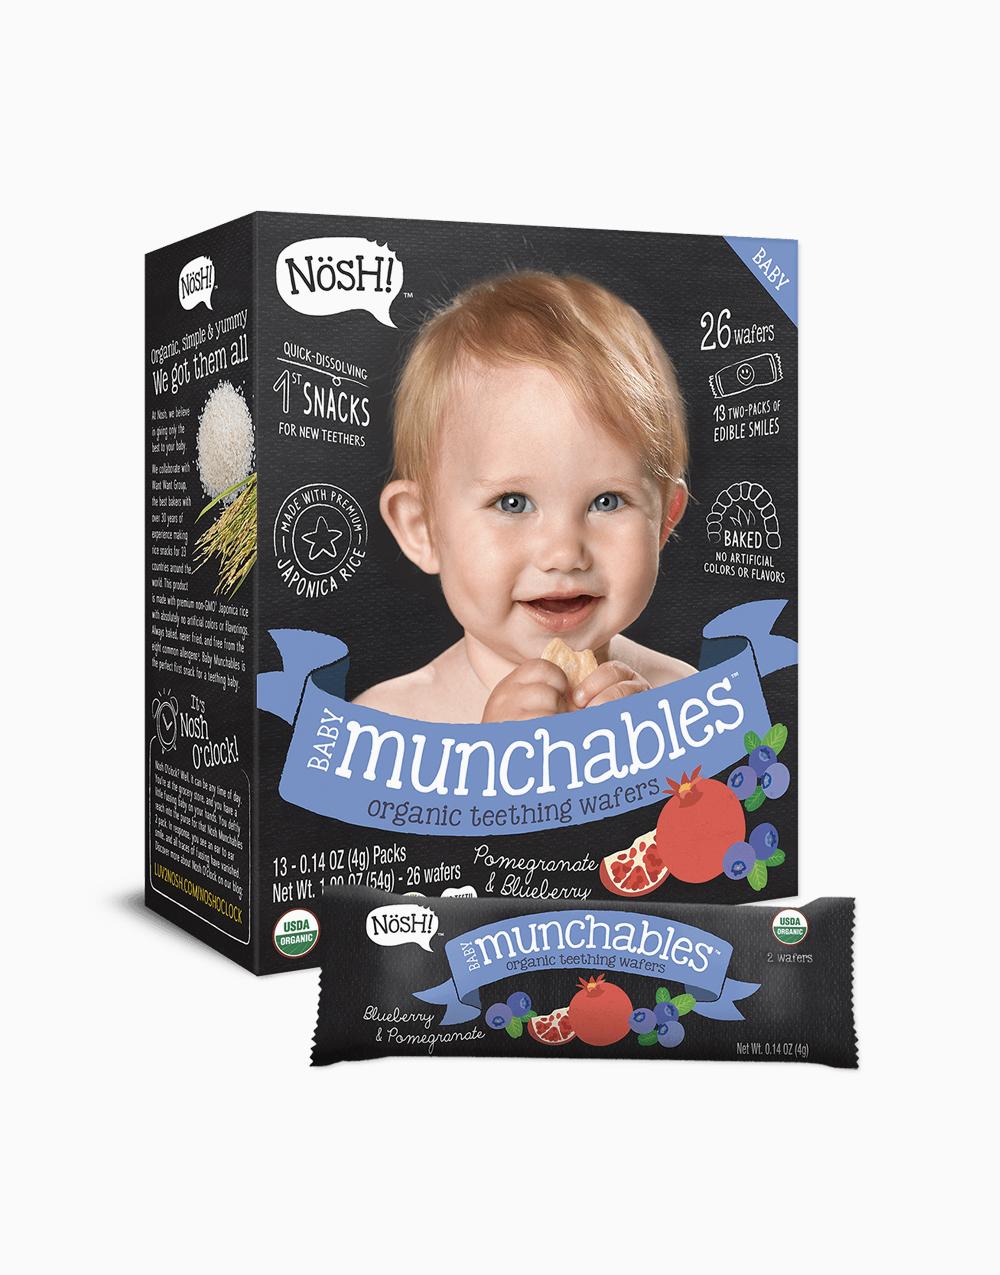 Blueberry Pomegranate Organic Vegan Baby Munchables by Nosh!